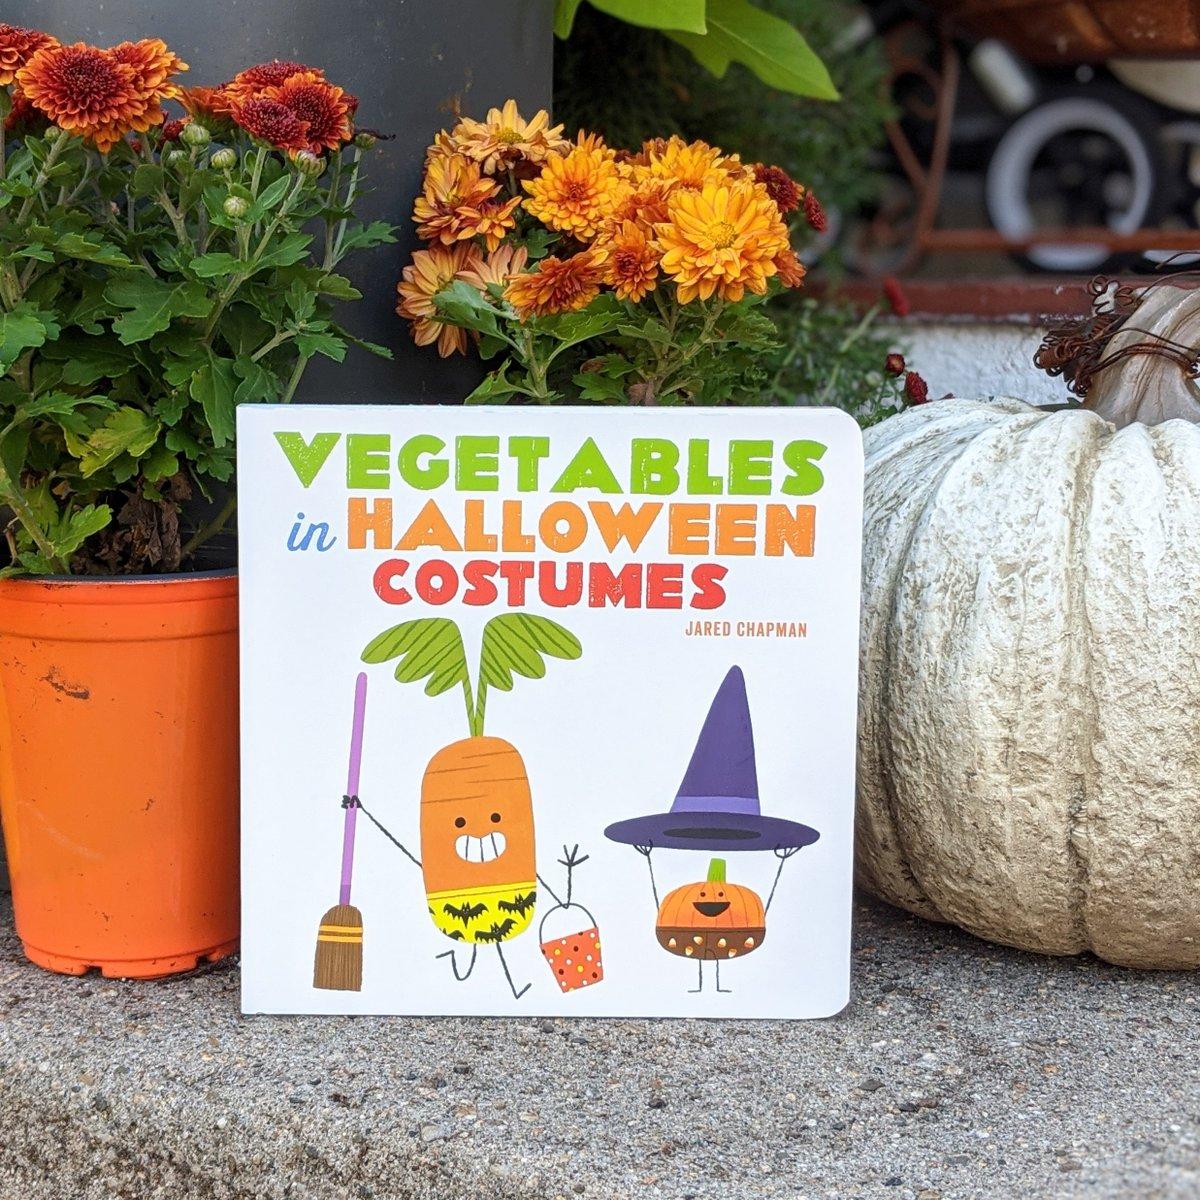 What's your pumpkin dressing as for Halloween? 🎃  @jaredchapman  #NationalPumpkinDay #VegetablesInUnderwear https://t.co/mqmmJcmqy1